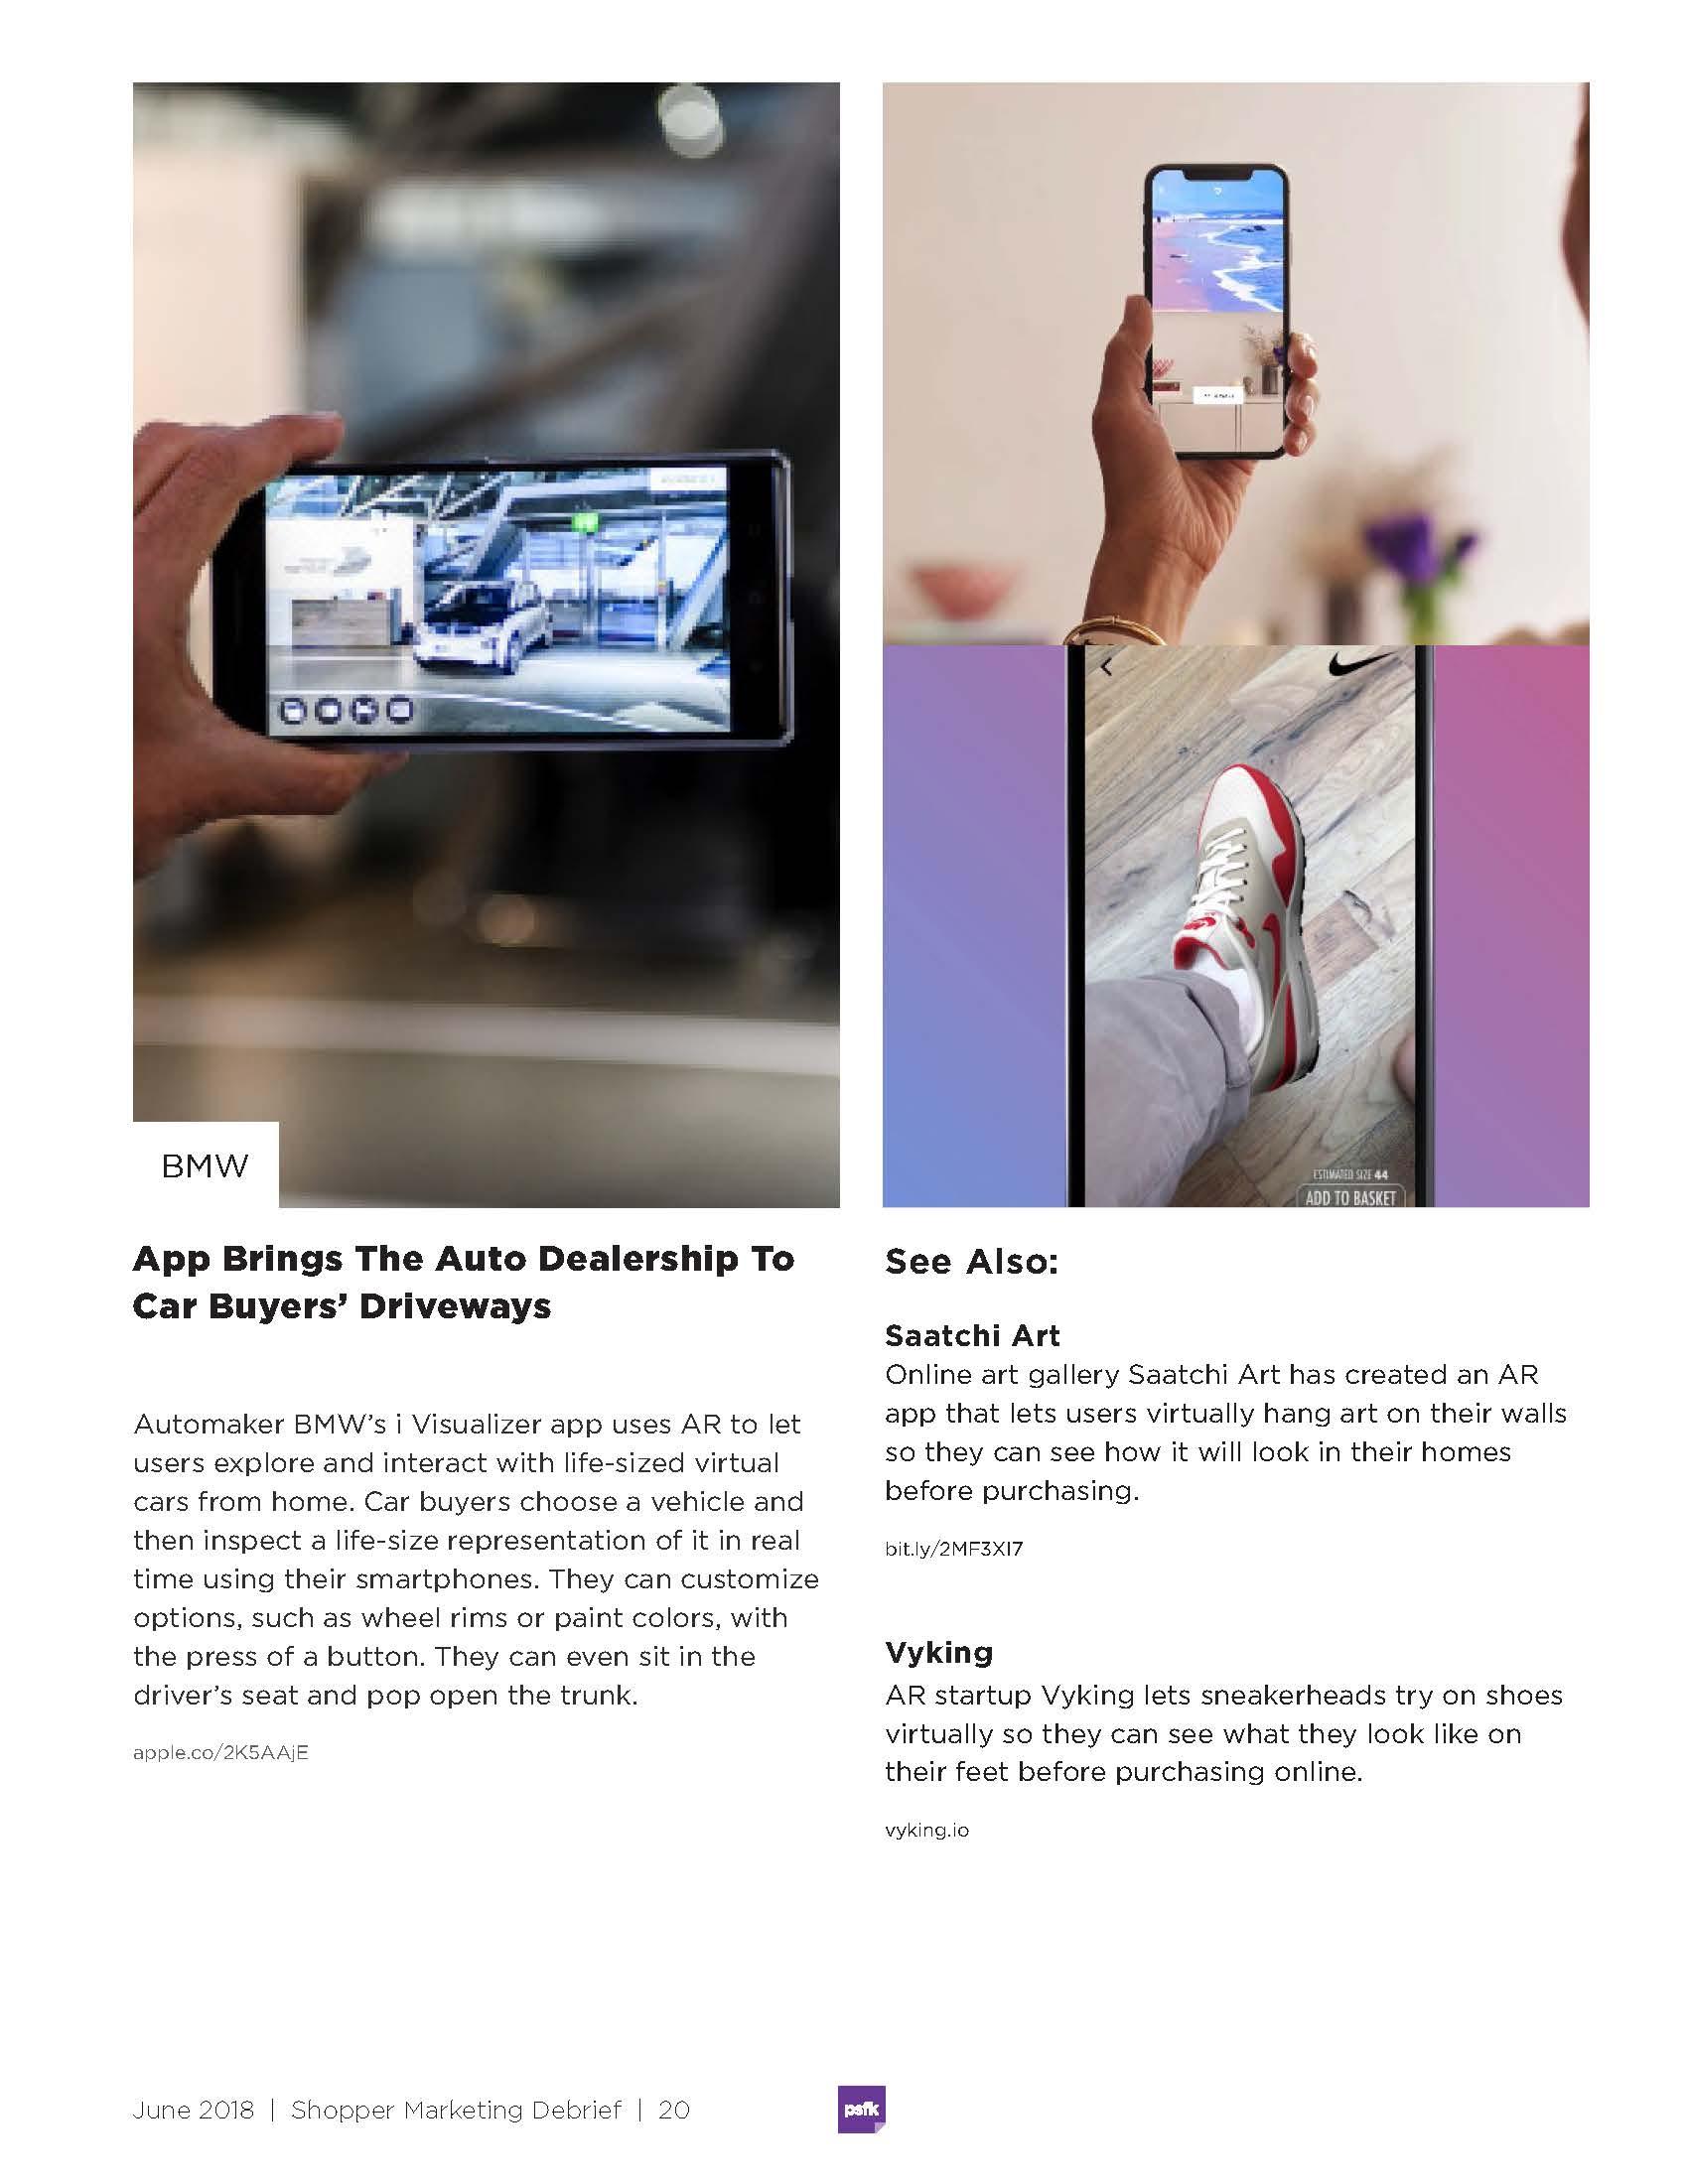 PSFK_AnnabelRuddle_Report_ShopperMarketingDebrief_Page_20.jpg